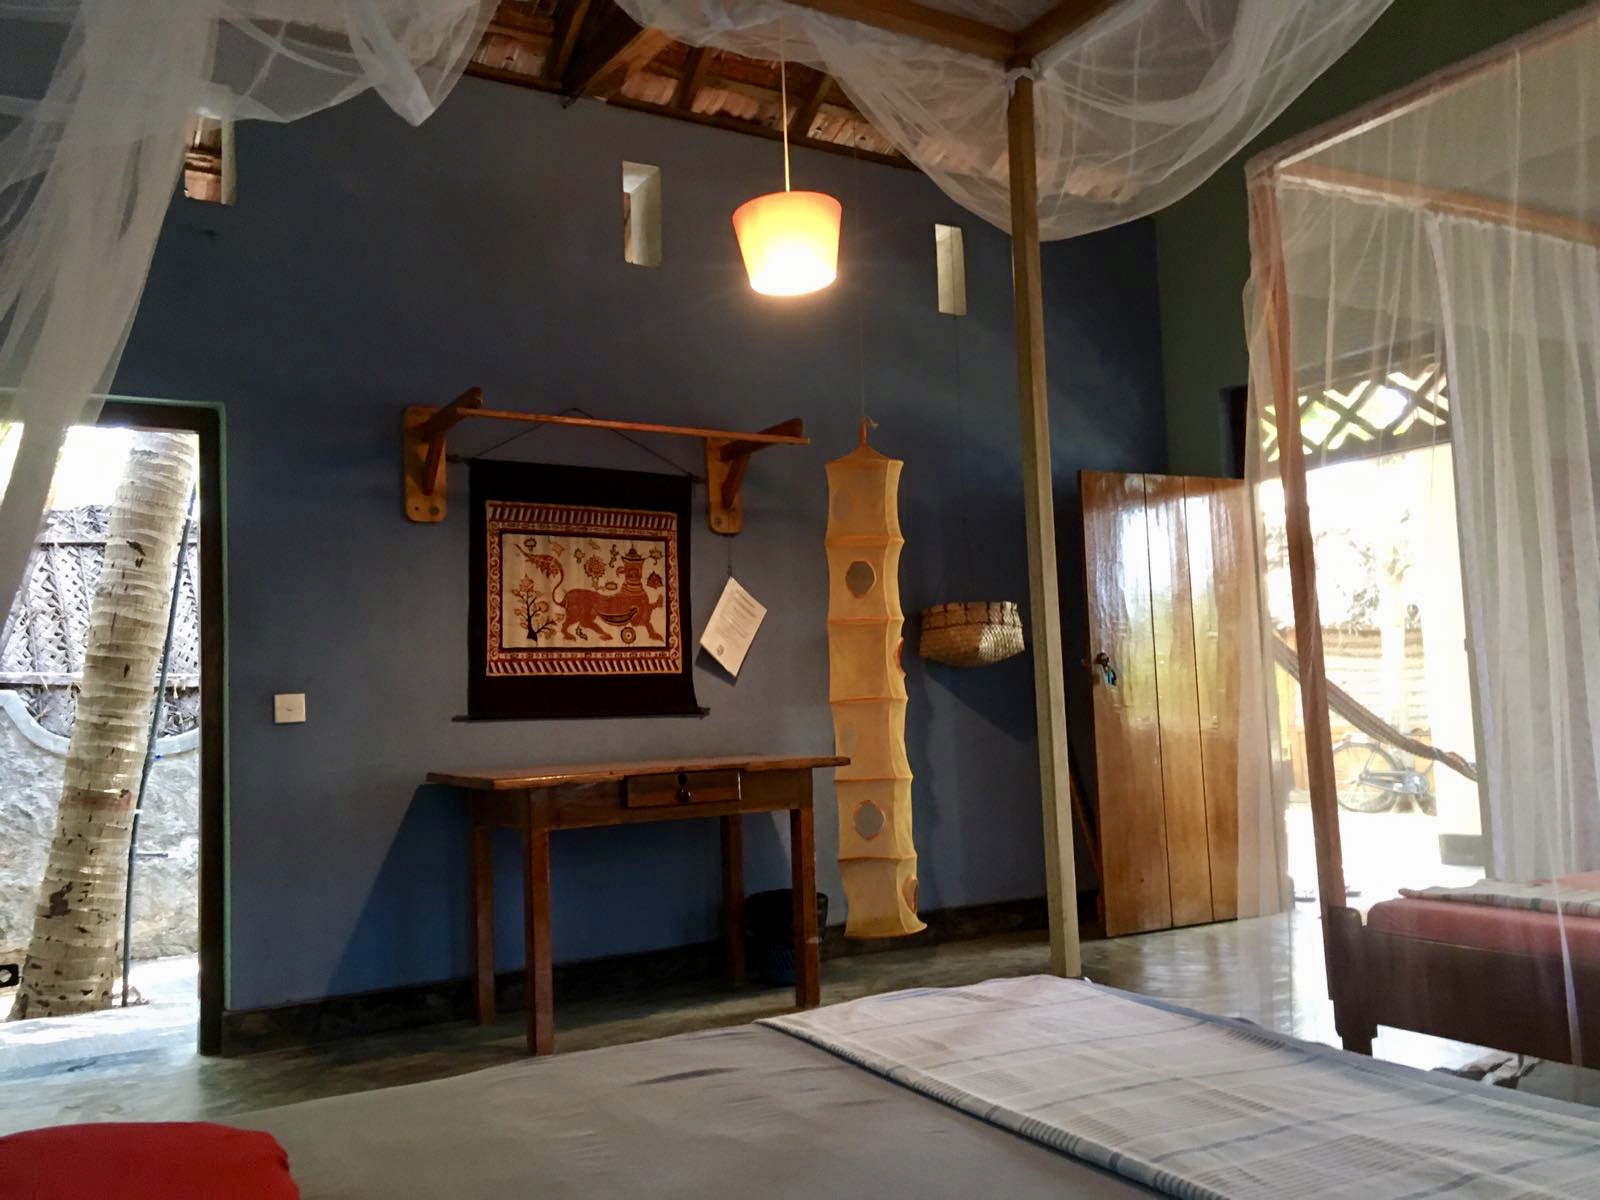 The Jerry Cabana / Lounge around